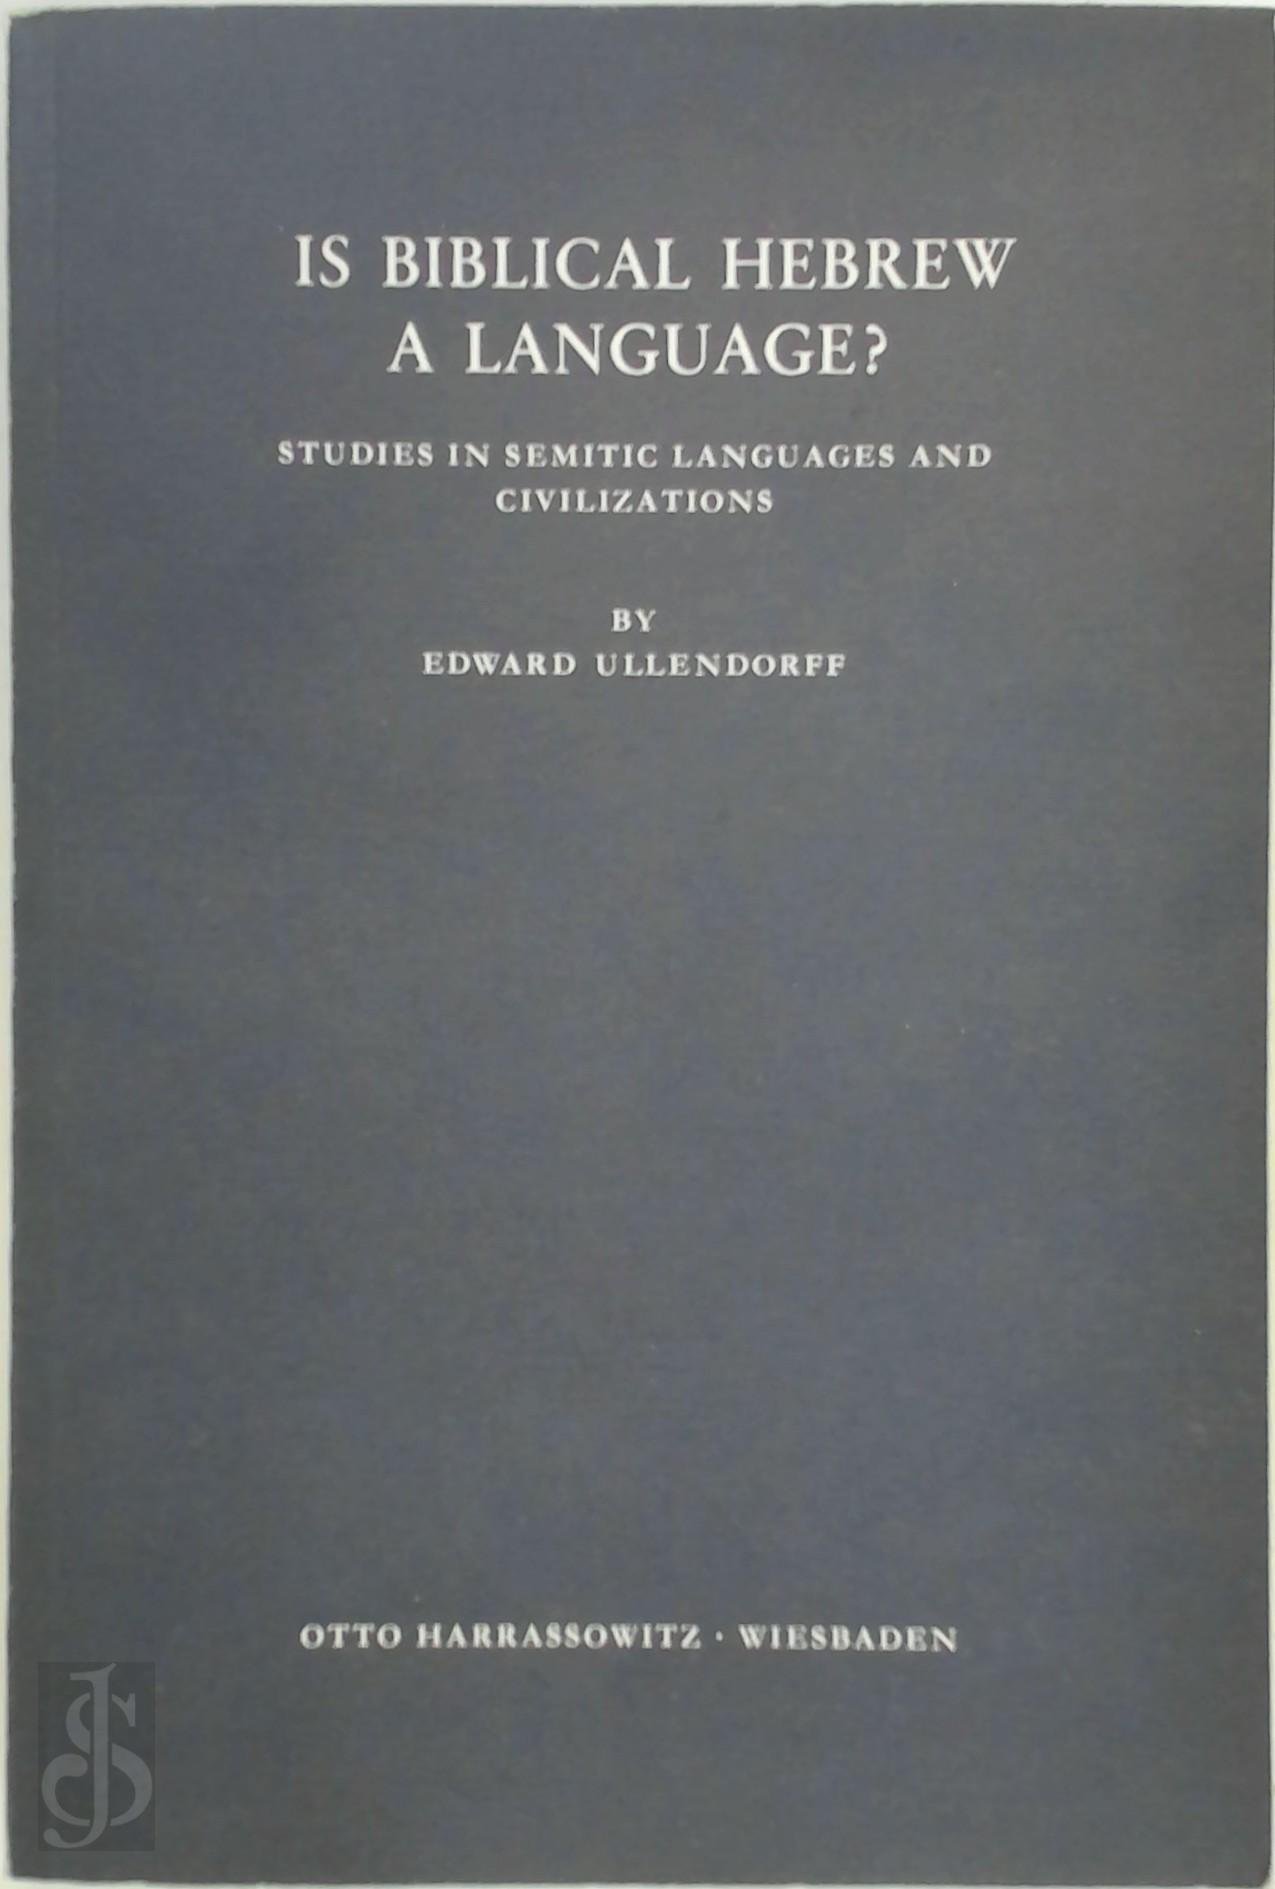 Edward Ullendorff - Is Biblical Hebrew a language? Studies in Semitic Languages and Civilizations